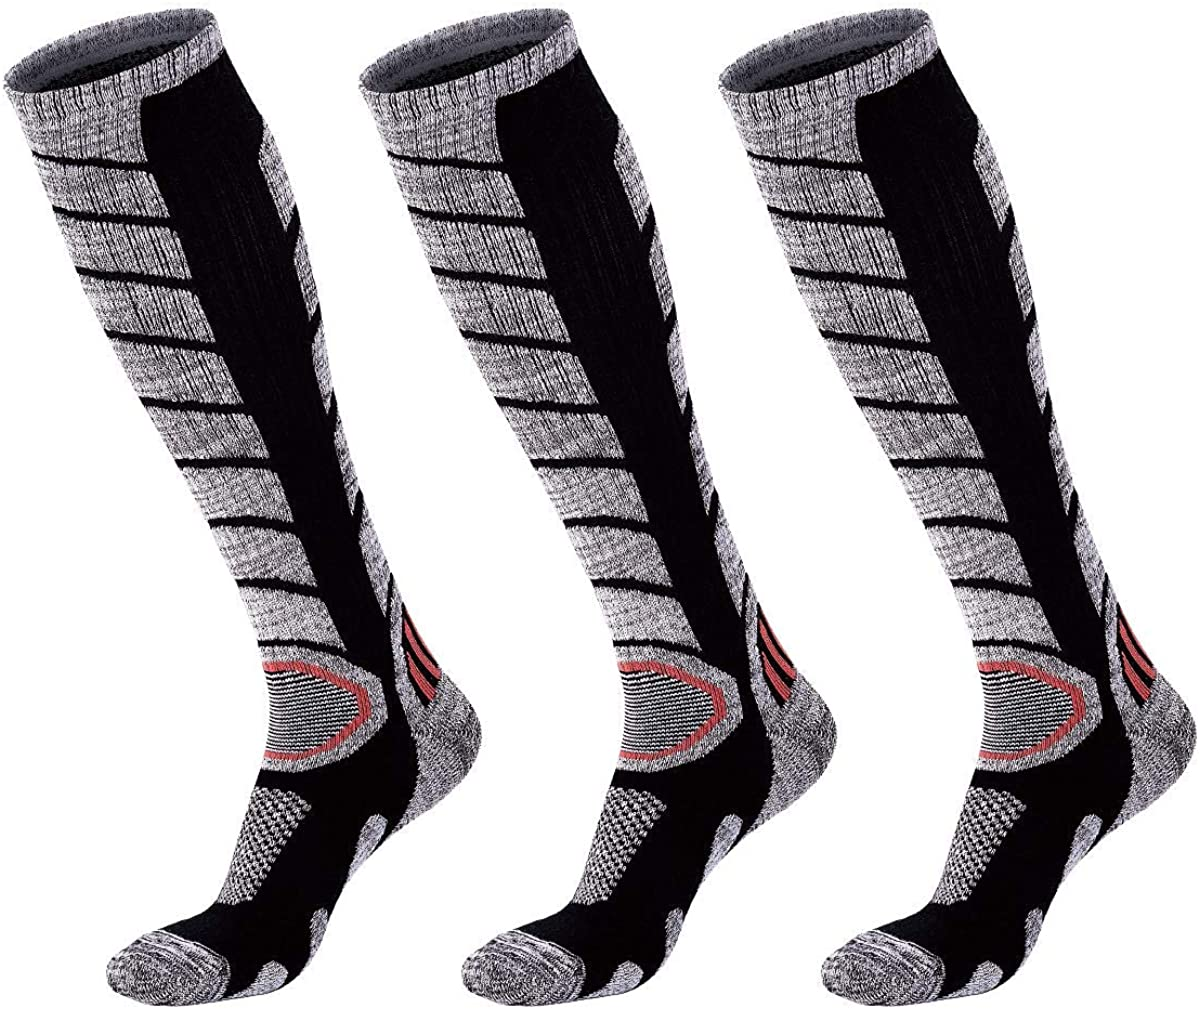 Snowboarding Performance Socks WEIERYA Ski Socks 2 Pairs Pack for Skiing